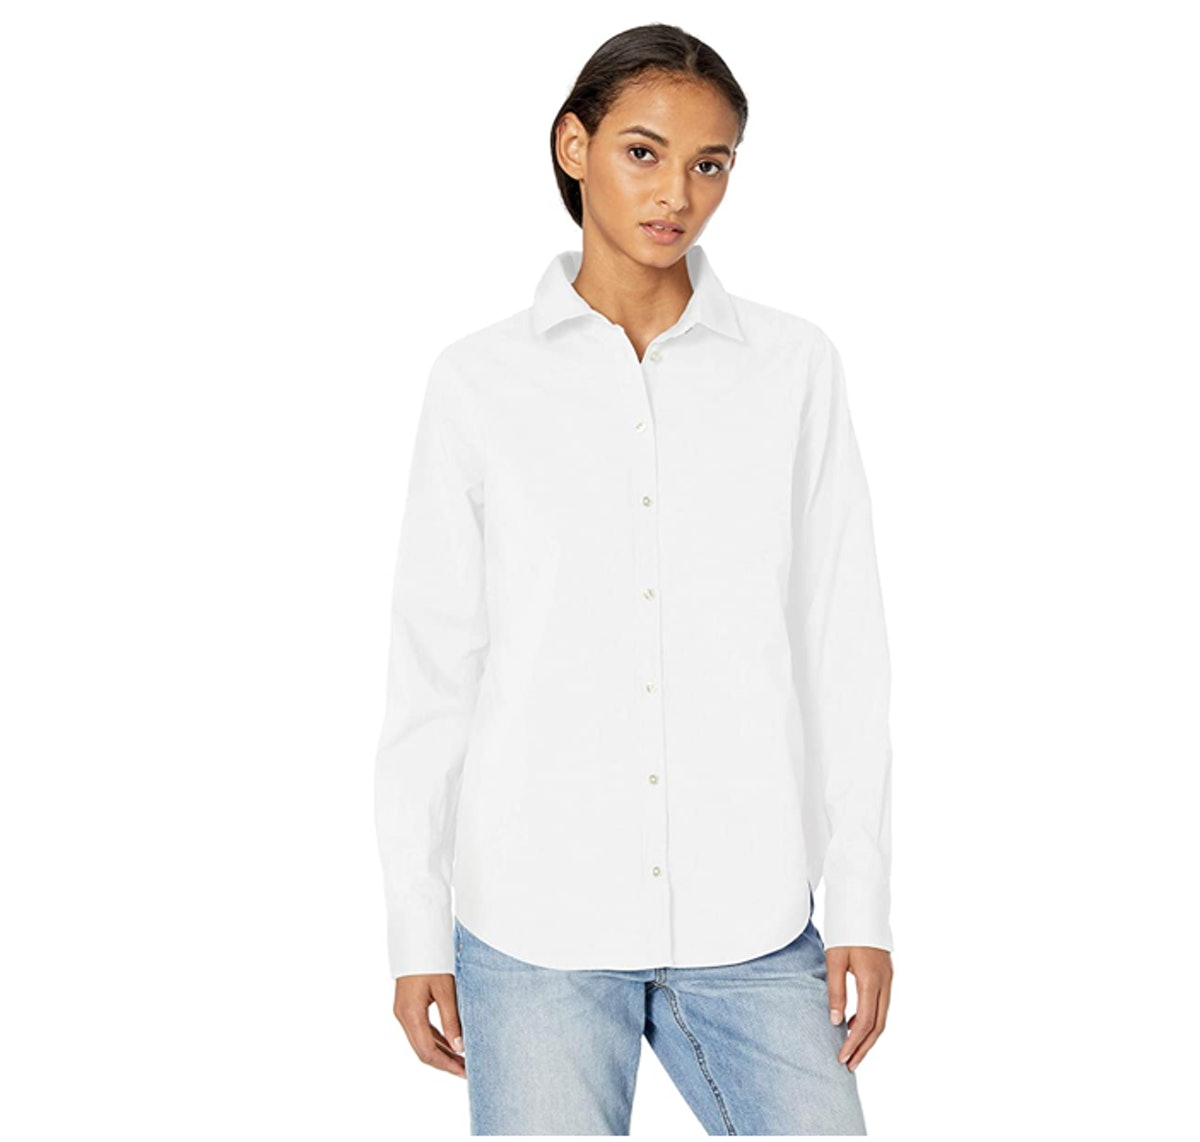 Amazon Essentials Long Sleeve Button Down Shirt